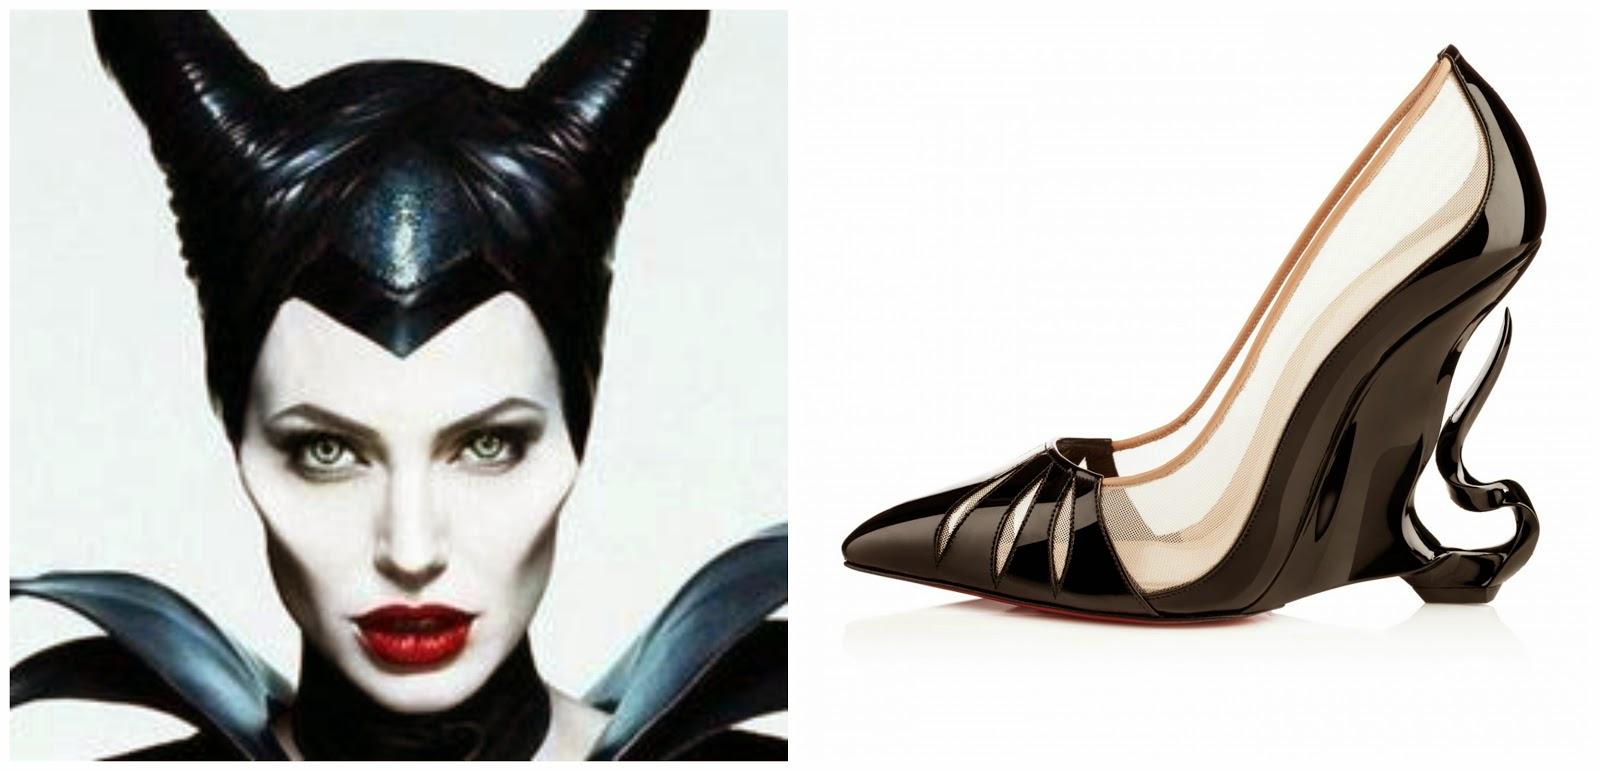 5365eb29ec81 Christian Louboutin    Malangeli Shoe. Christian Louboutin have  collaborated with Angelina Jolie ...